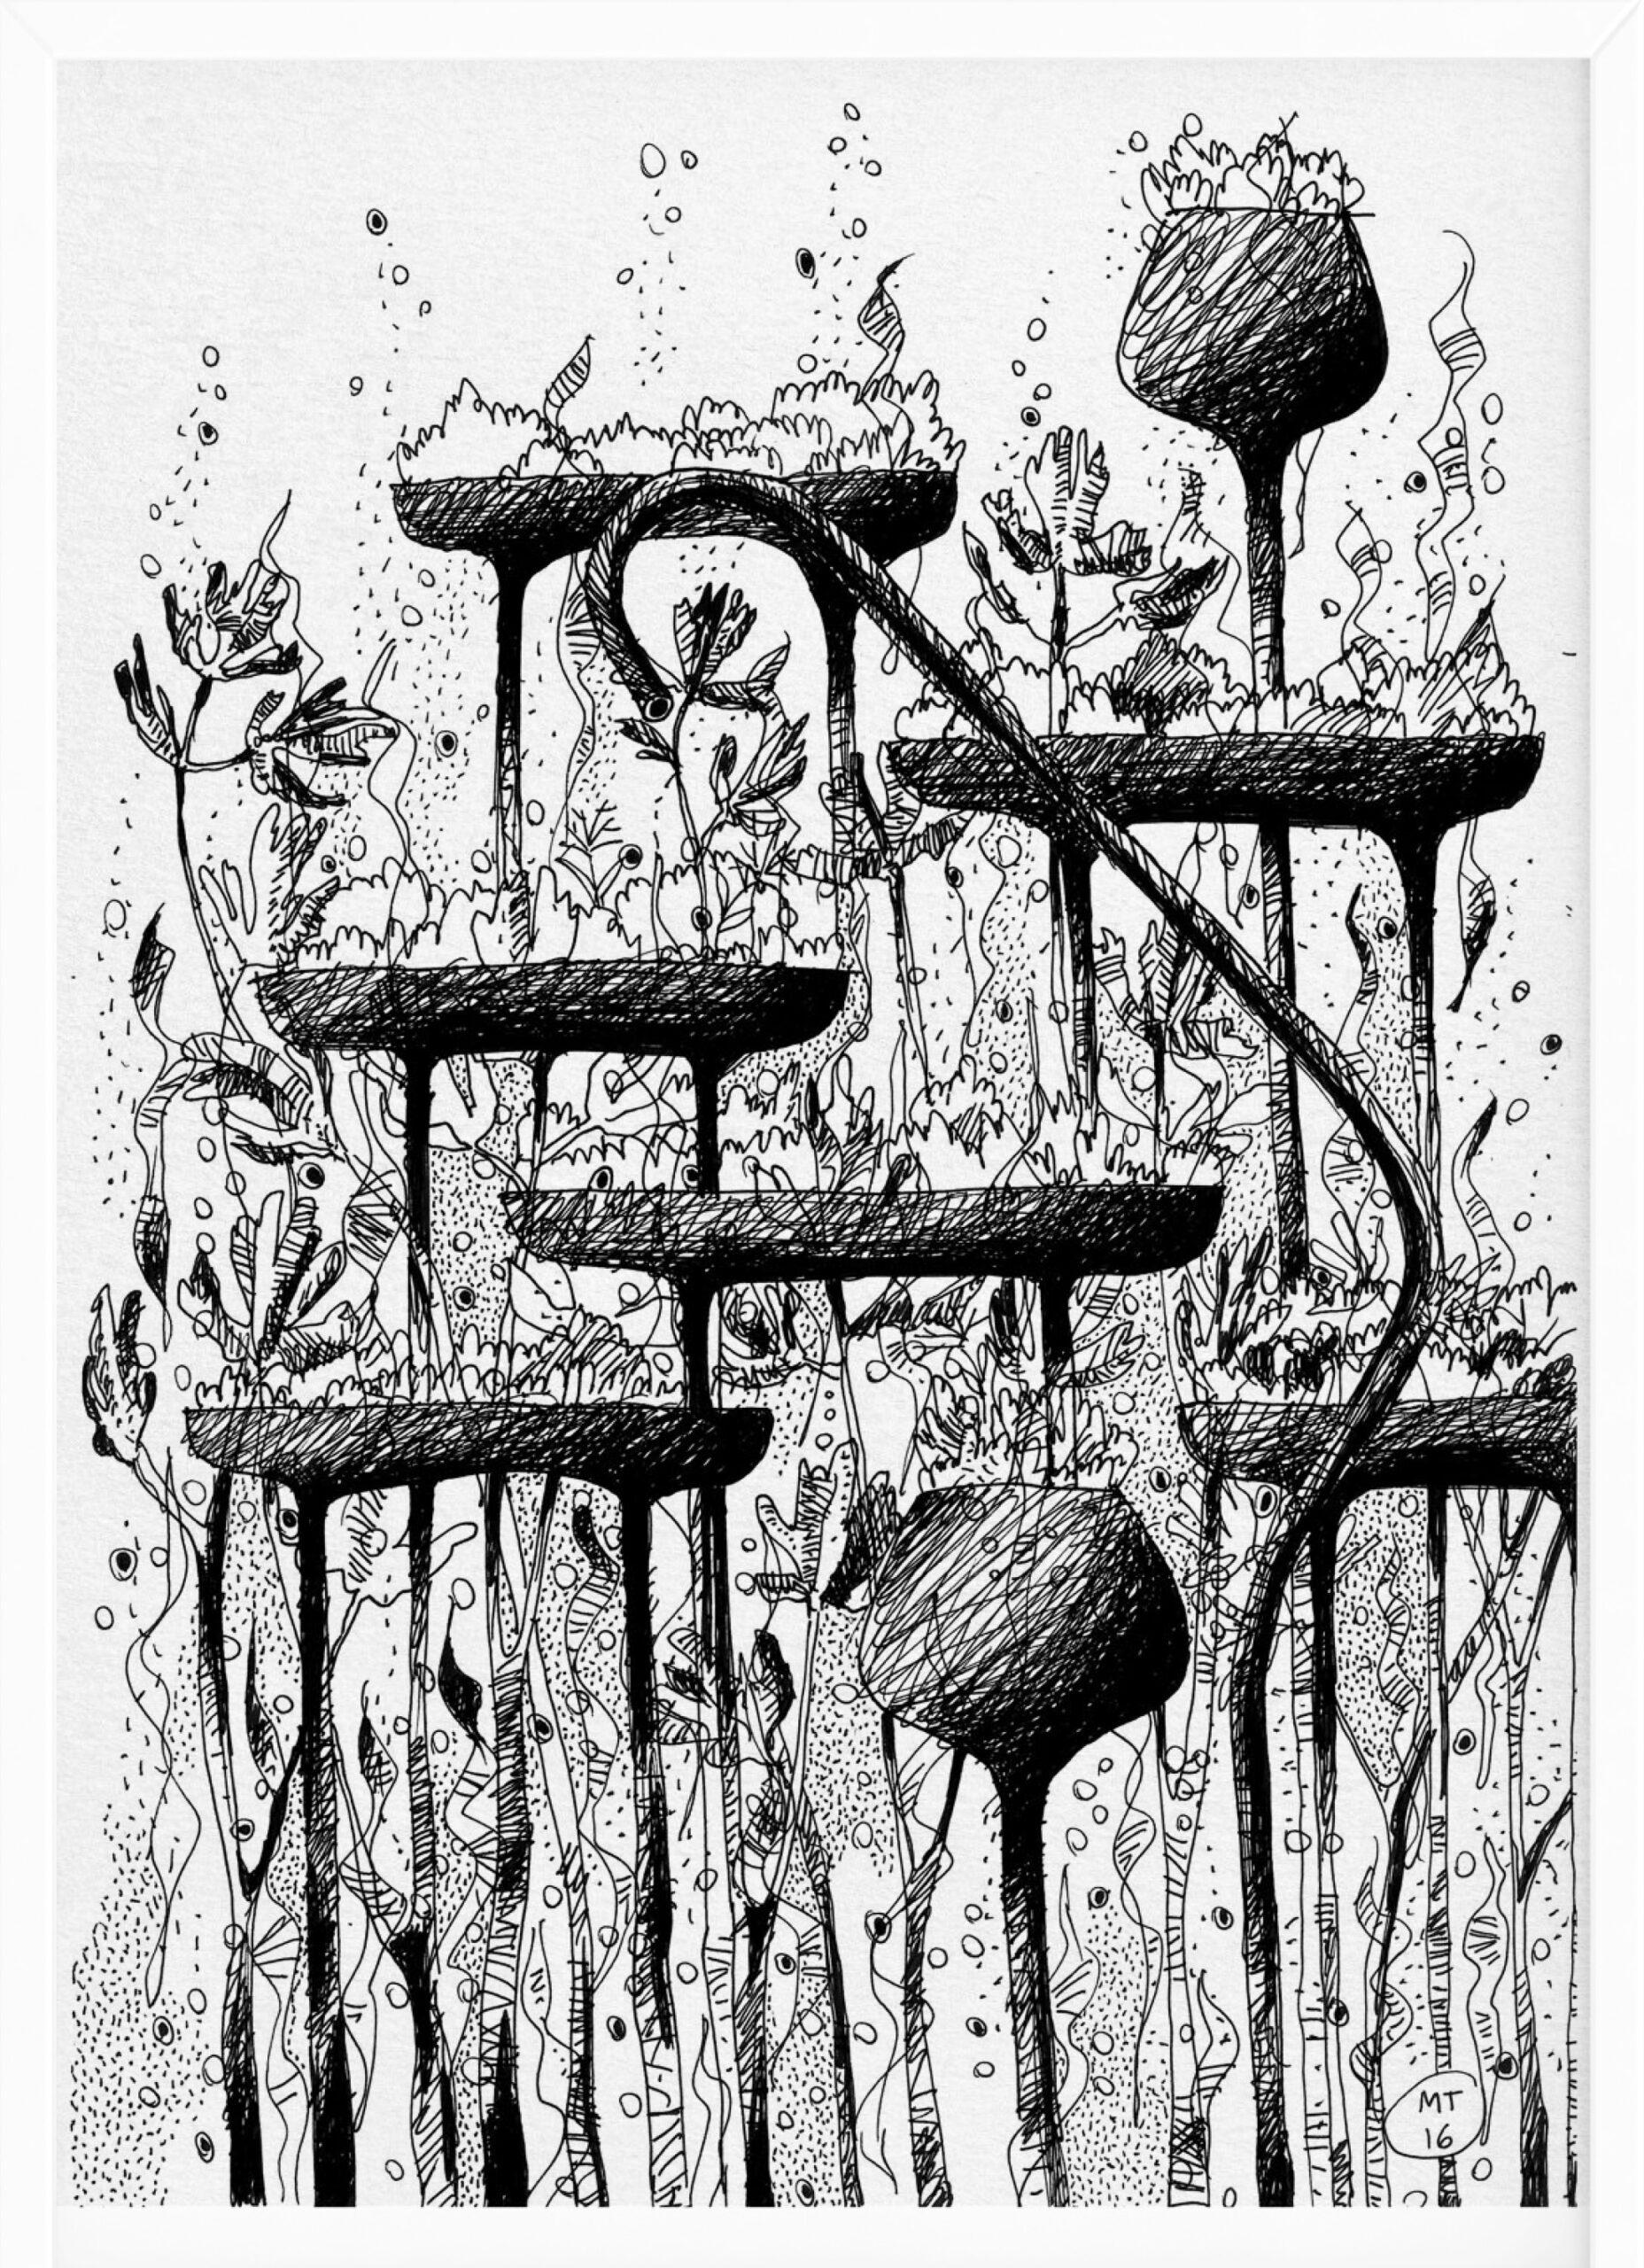 Rain | Drawings | Mario Trimarchi Design6